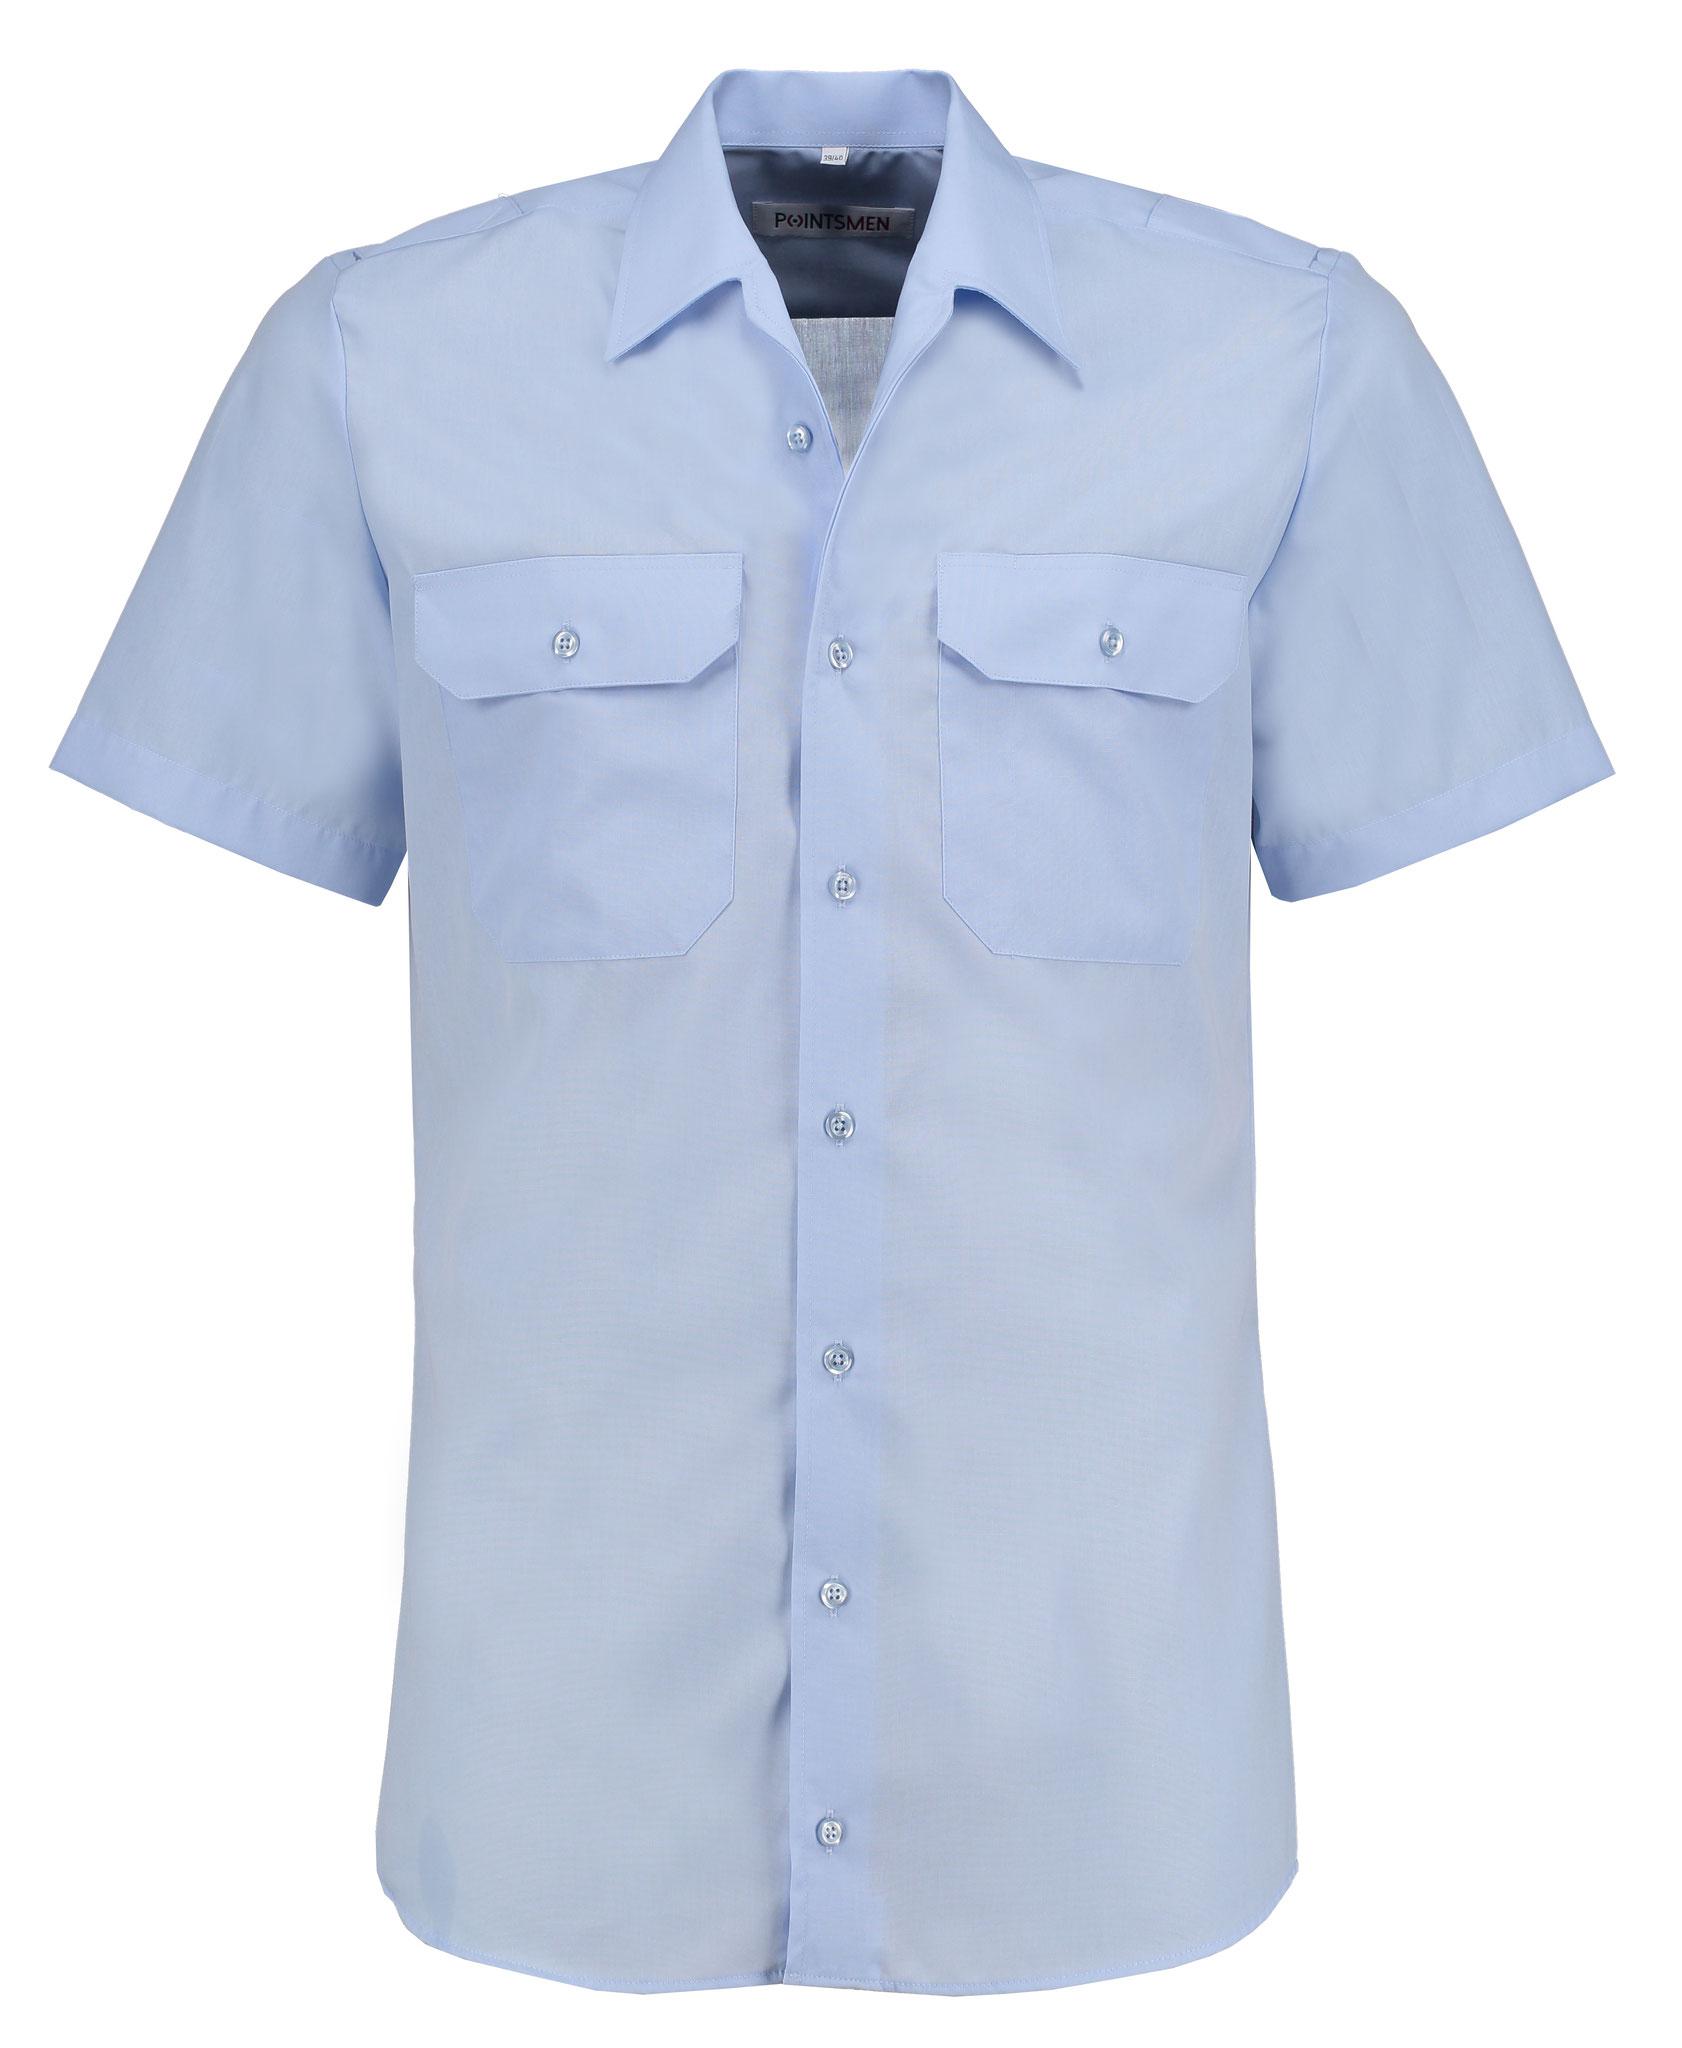 Diensthemd hellblau kurzarm